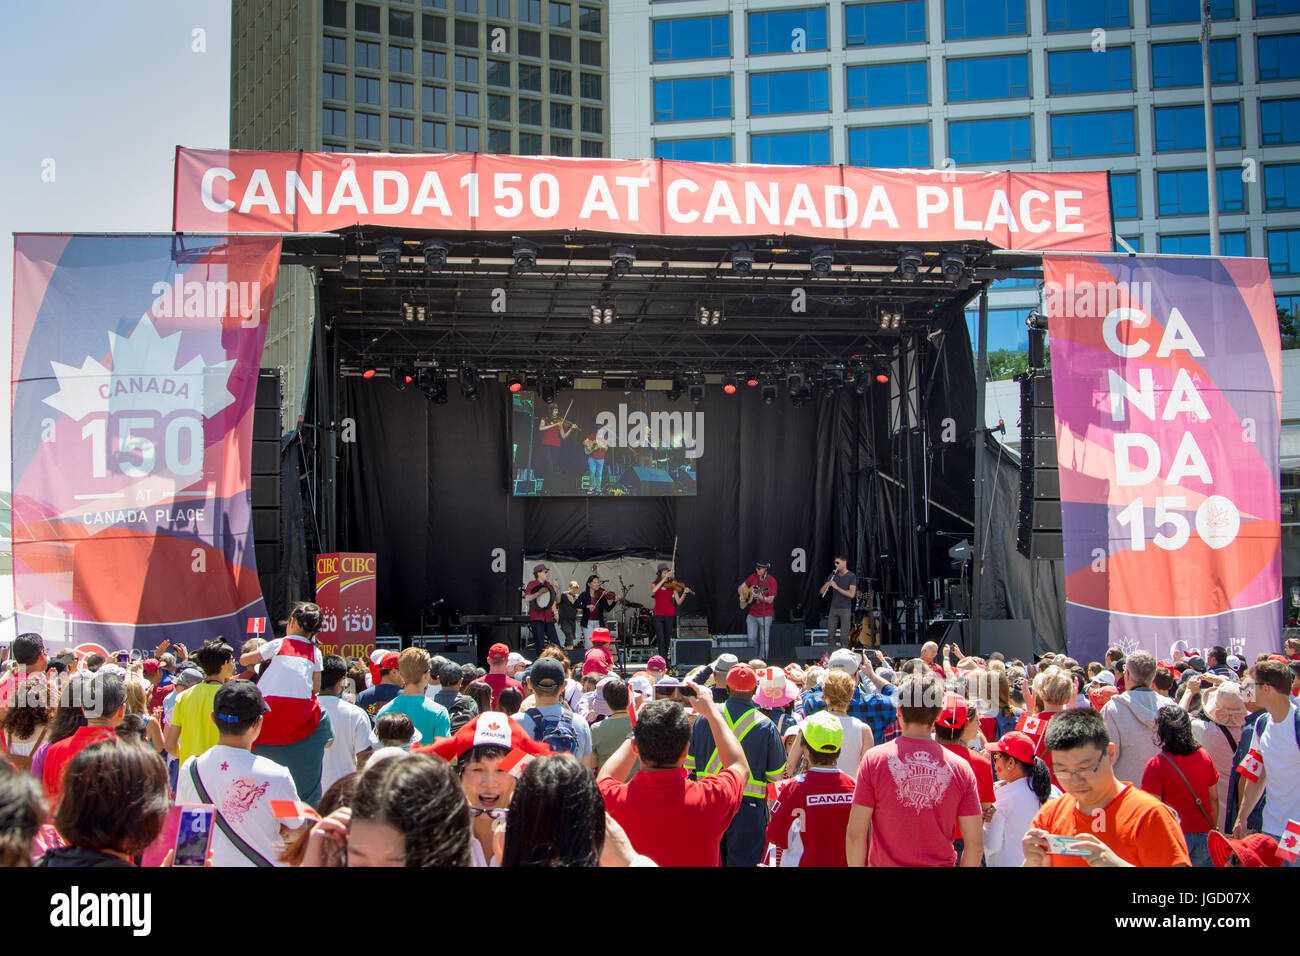 Candada Celebrates Canada 150 Day in Vancouver, July, 1, 2017, Canada Day 150, Vancouver, Canada - Stock Image